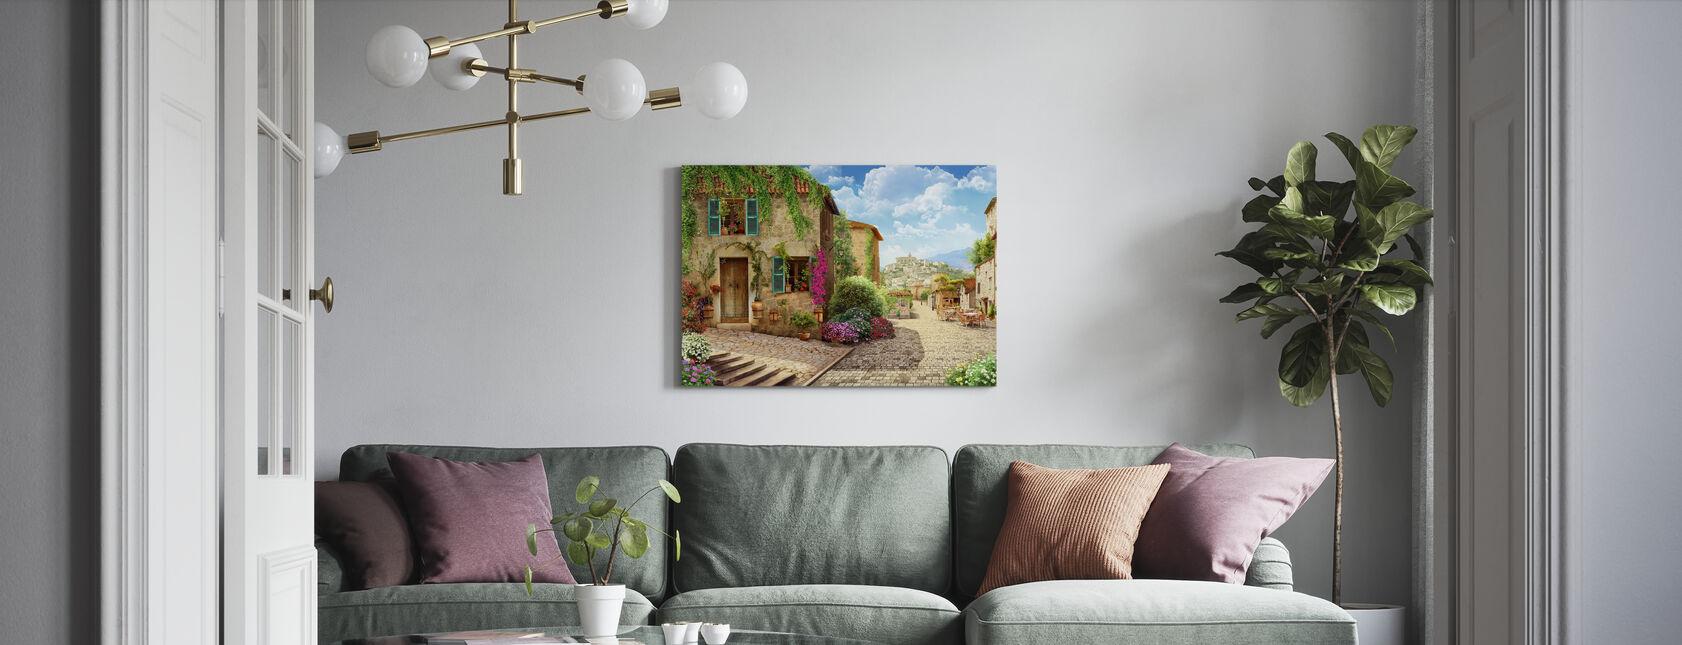 Tuscany Street - Canvas print - Living Room